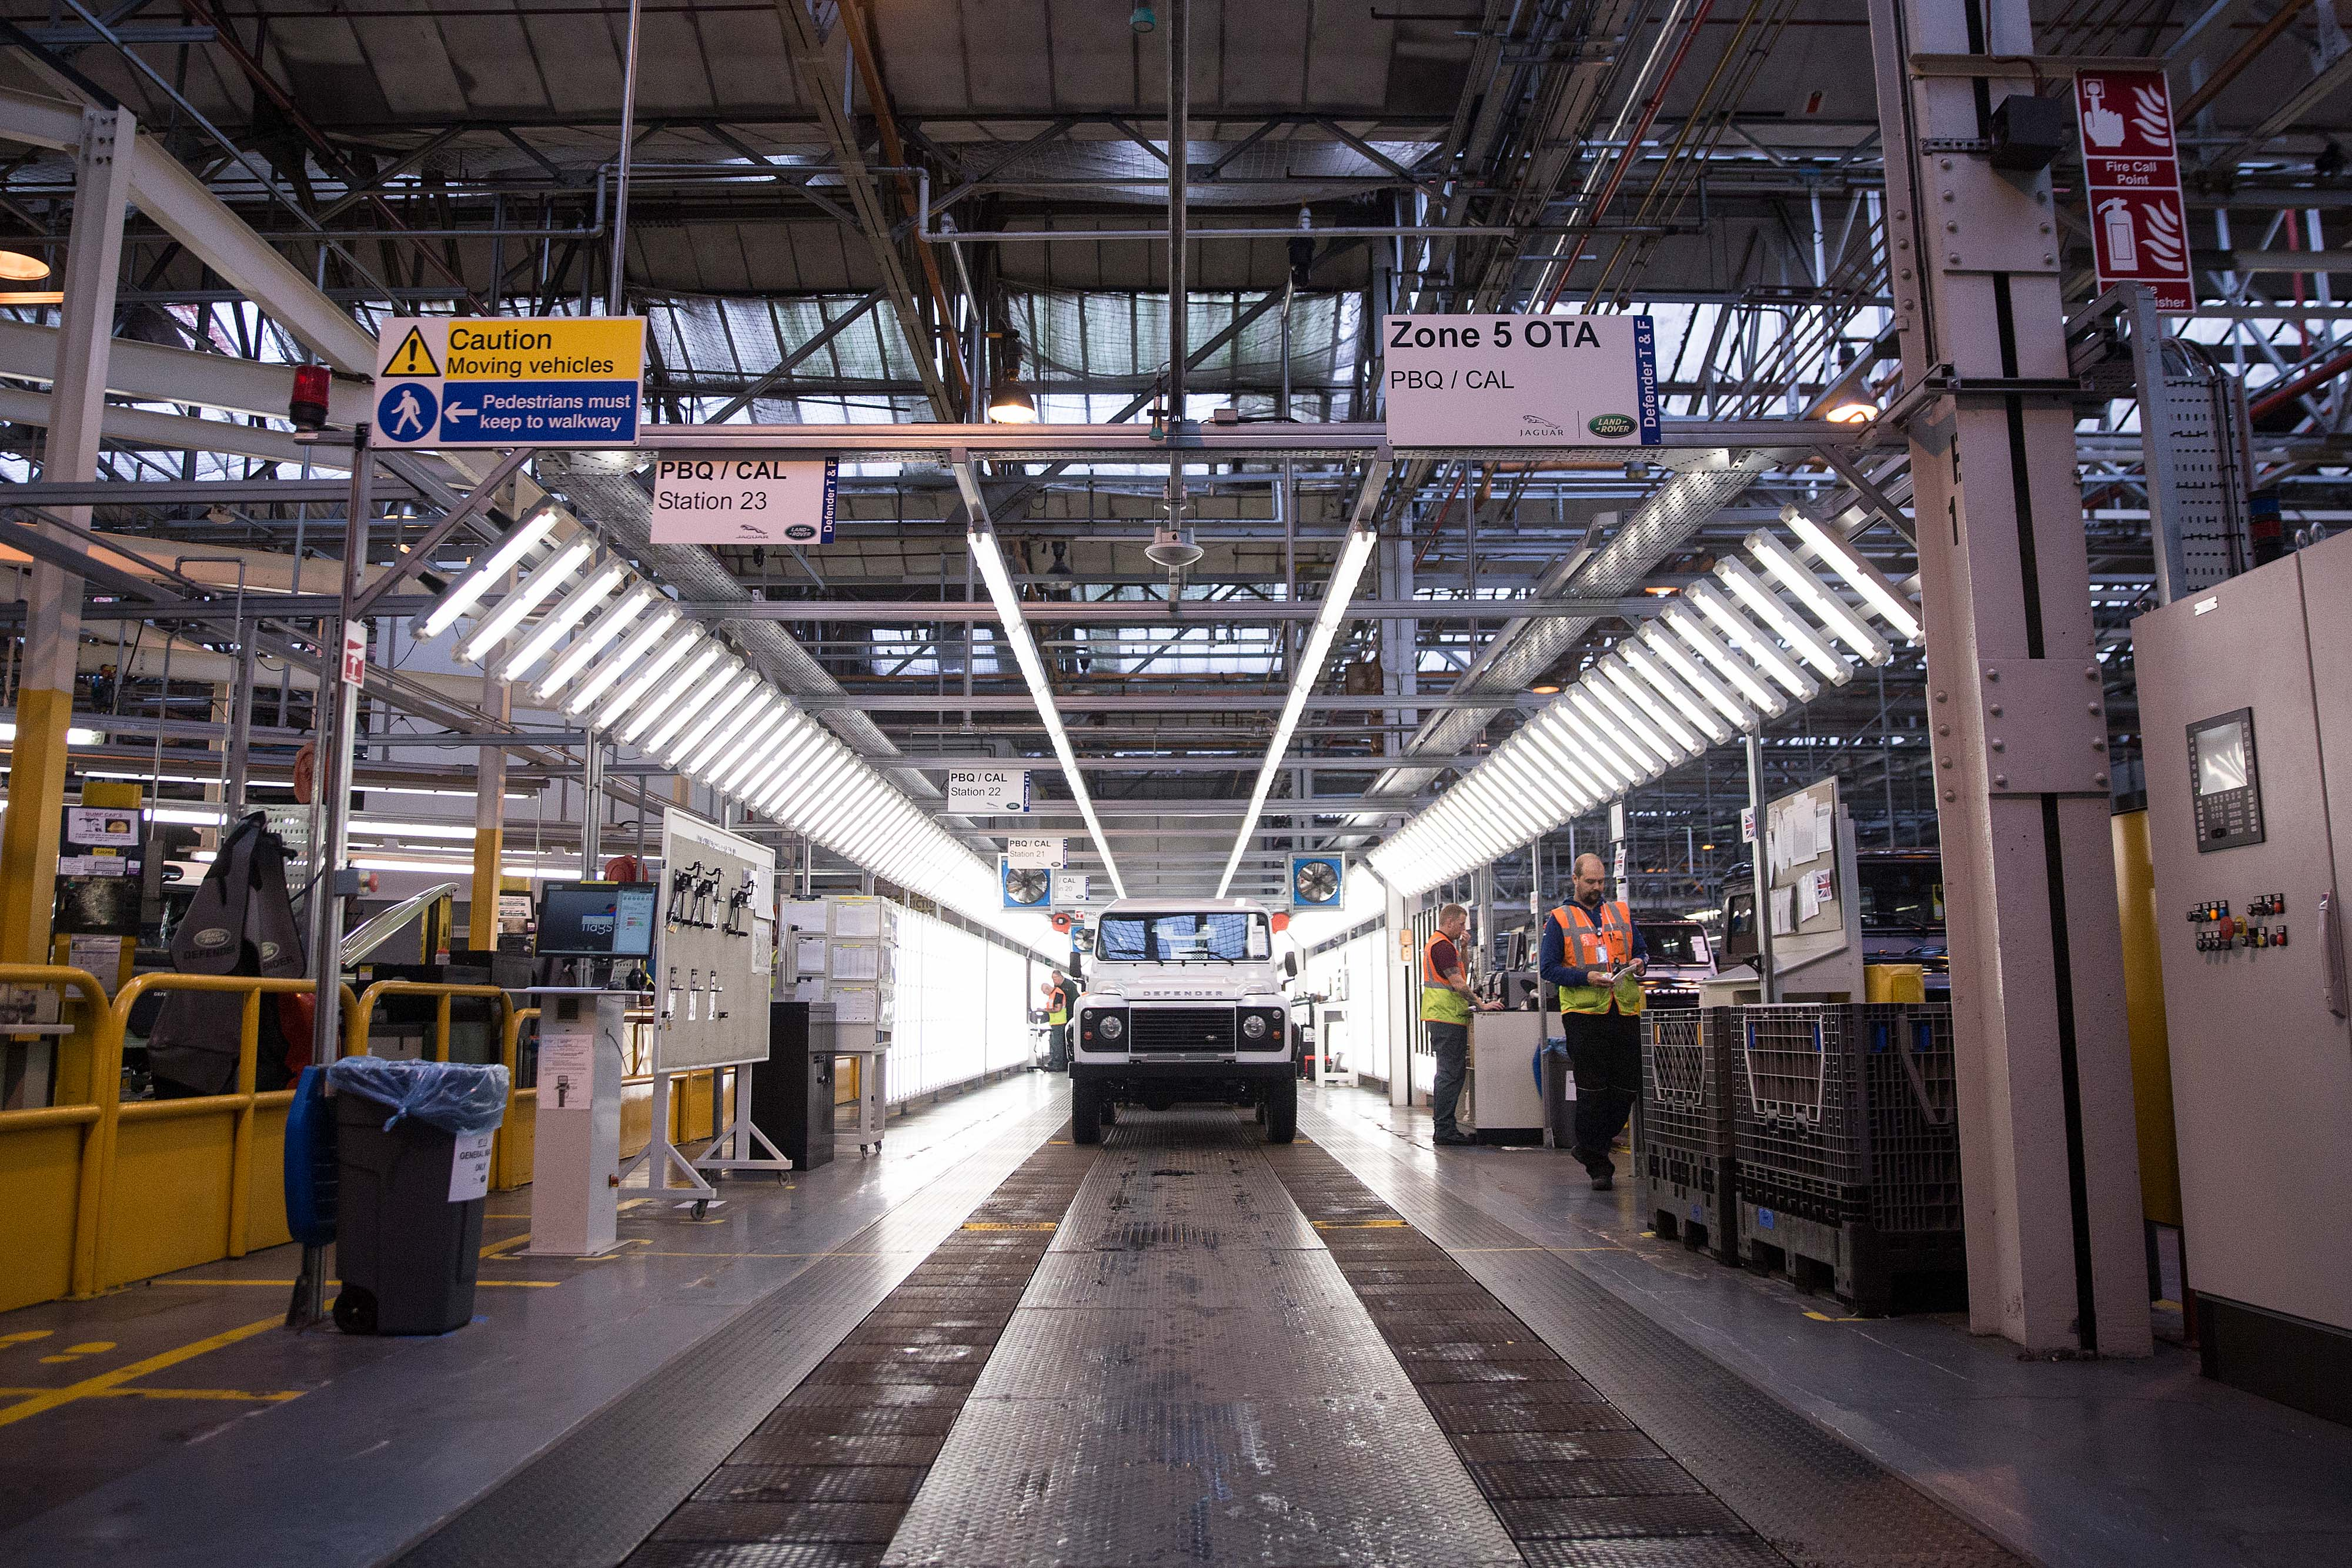 Production Of Land Rover Defenders At Tata Motors Ltd.'s Jaguar Land Rover Vehicle Manufacturing Plant